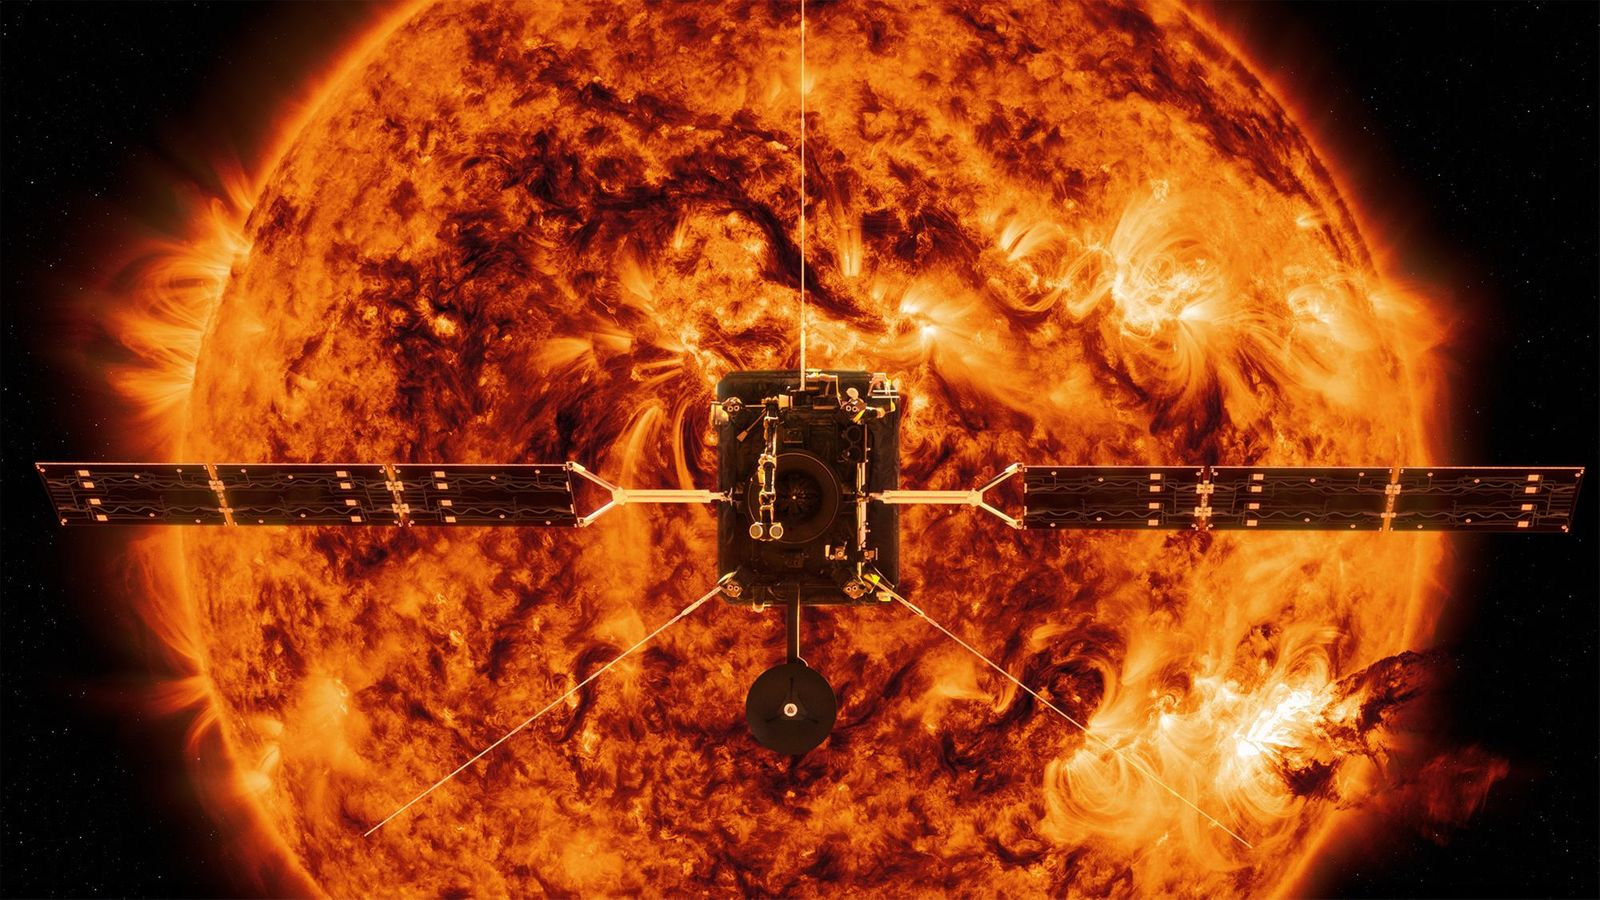 FILES-US-SCIENCE-SPACE-SOLAR ORBITER